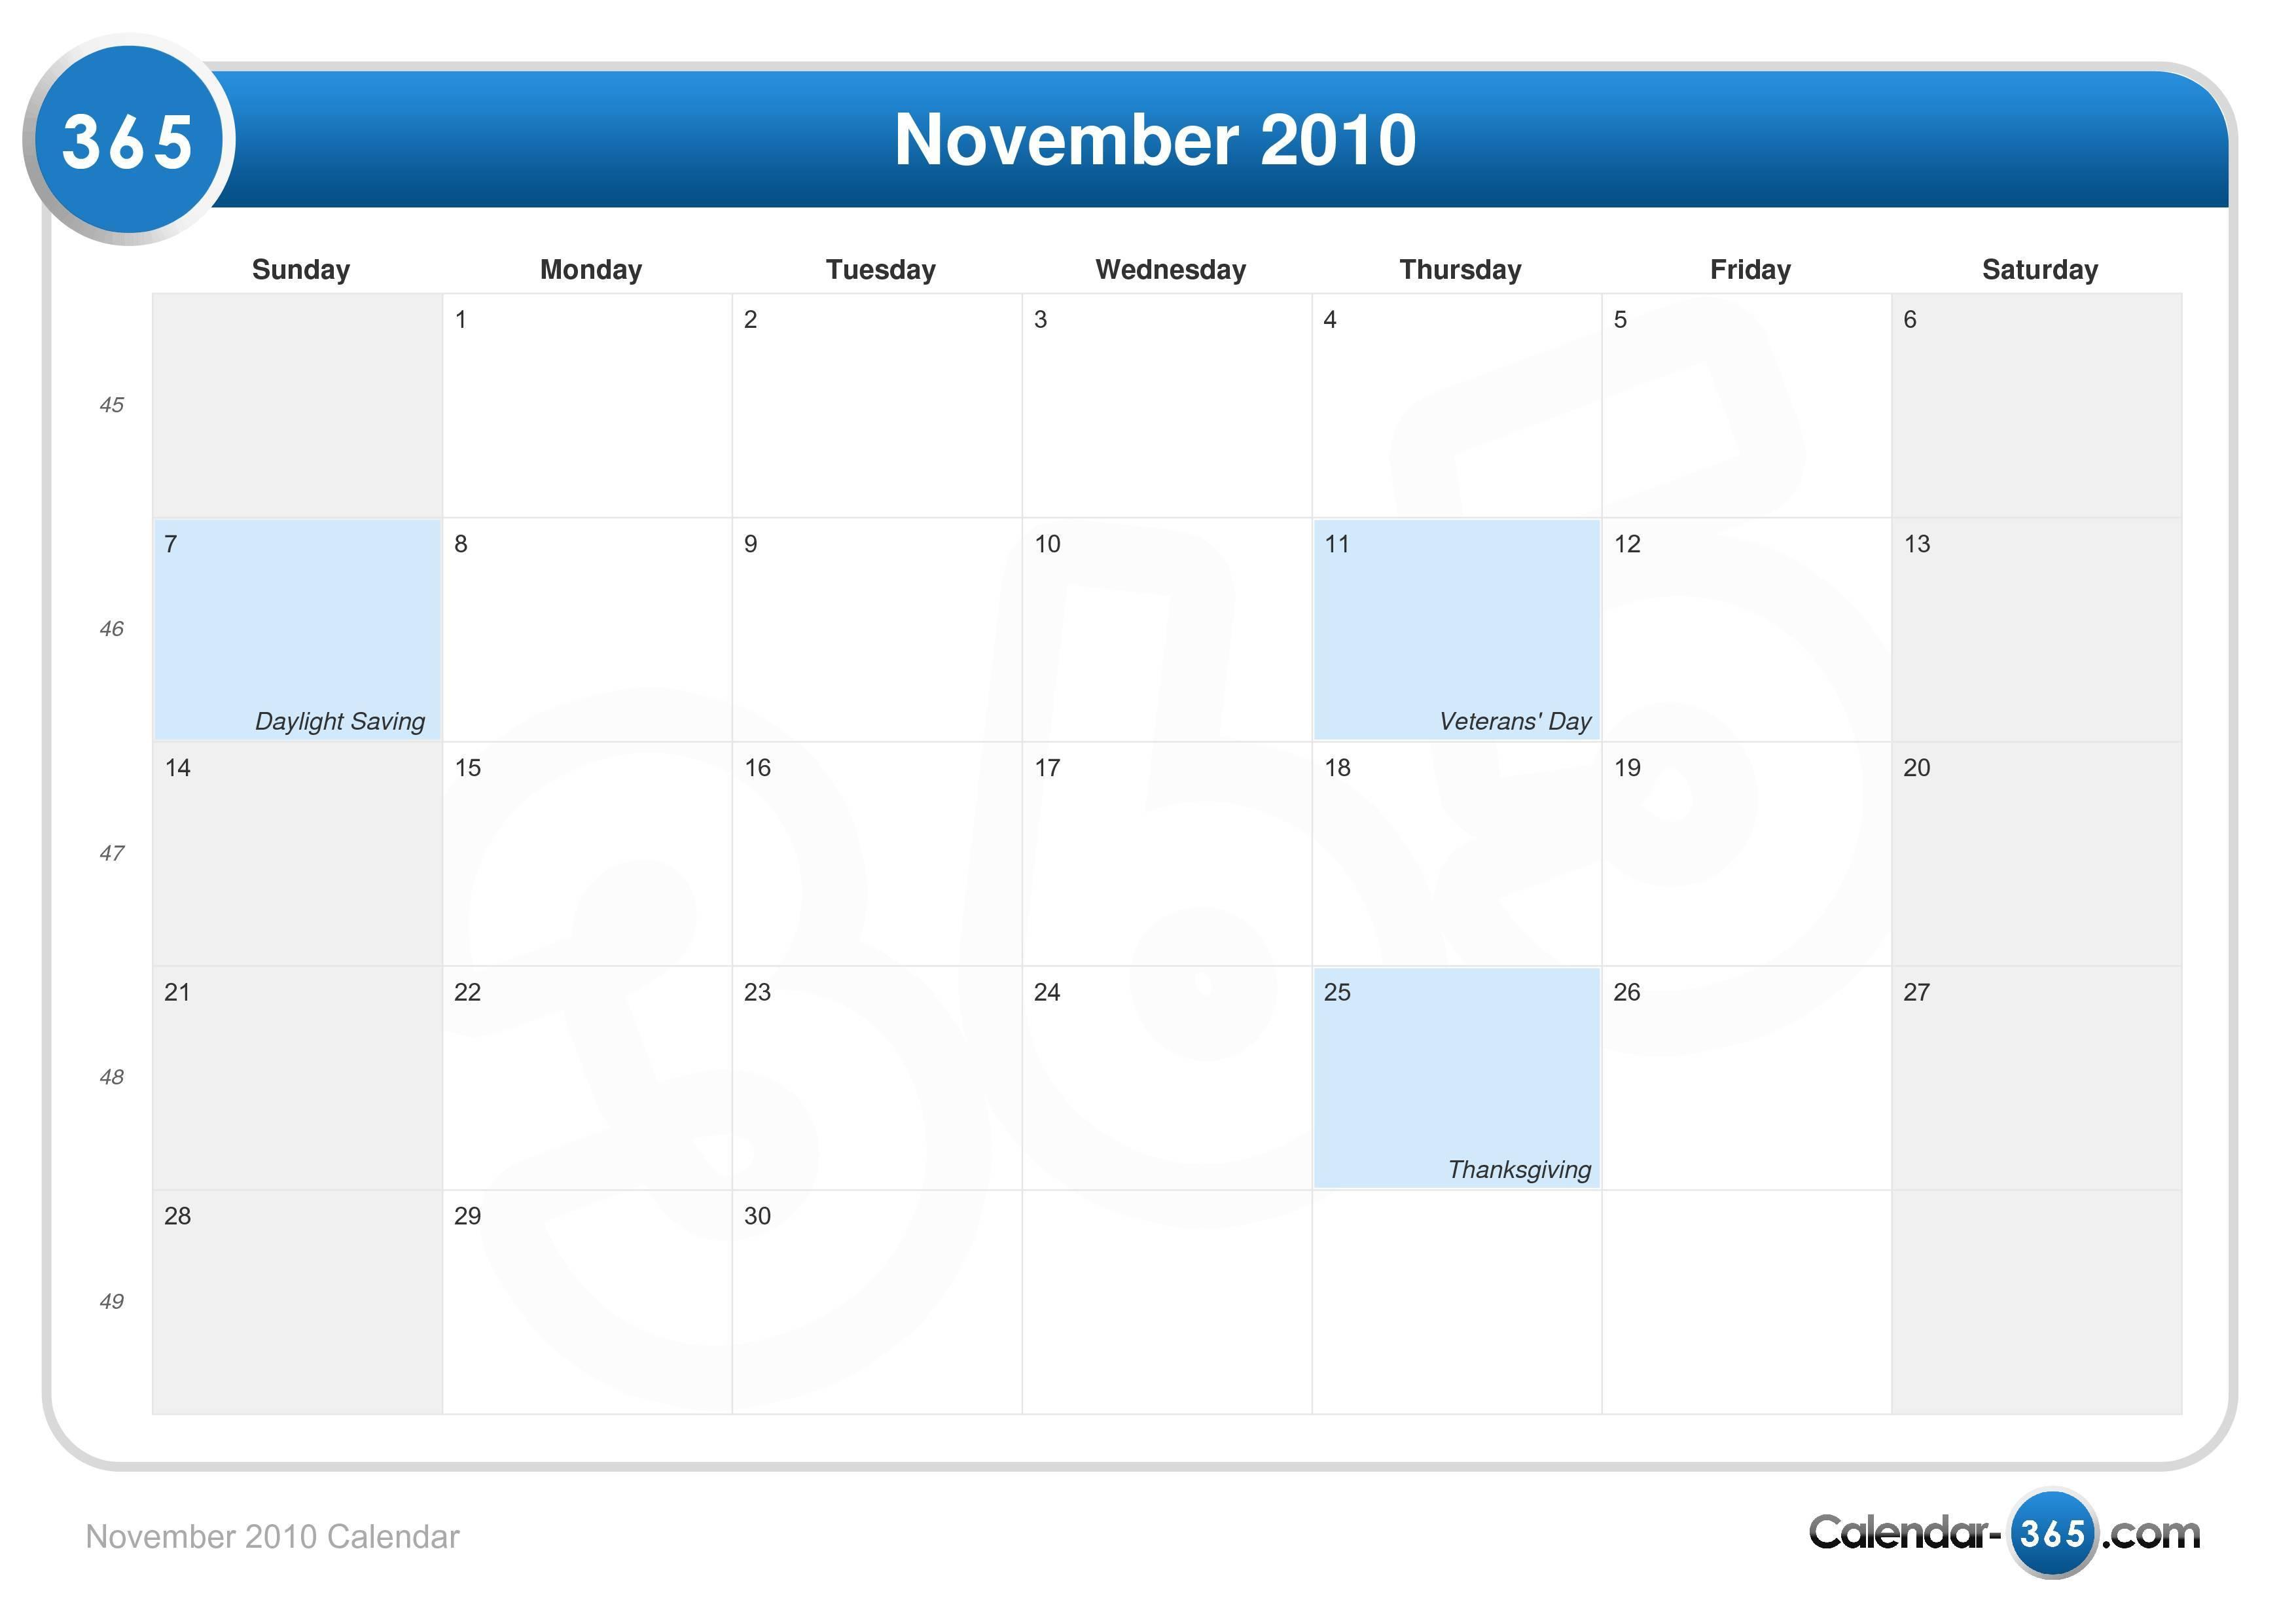 November 2010 Calendar